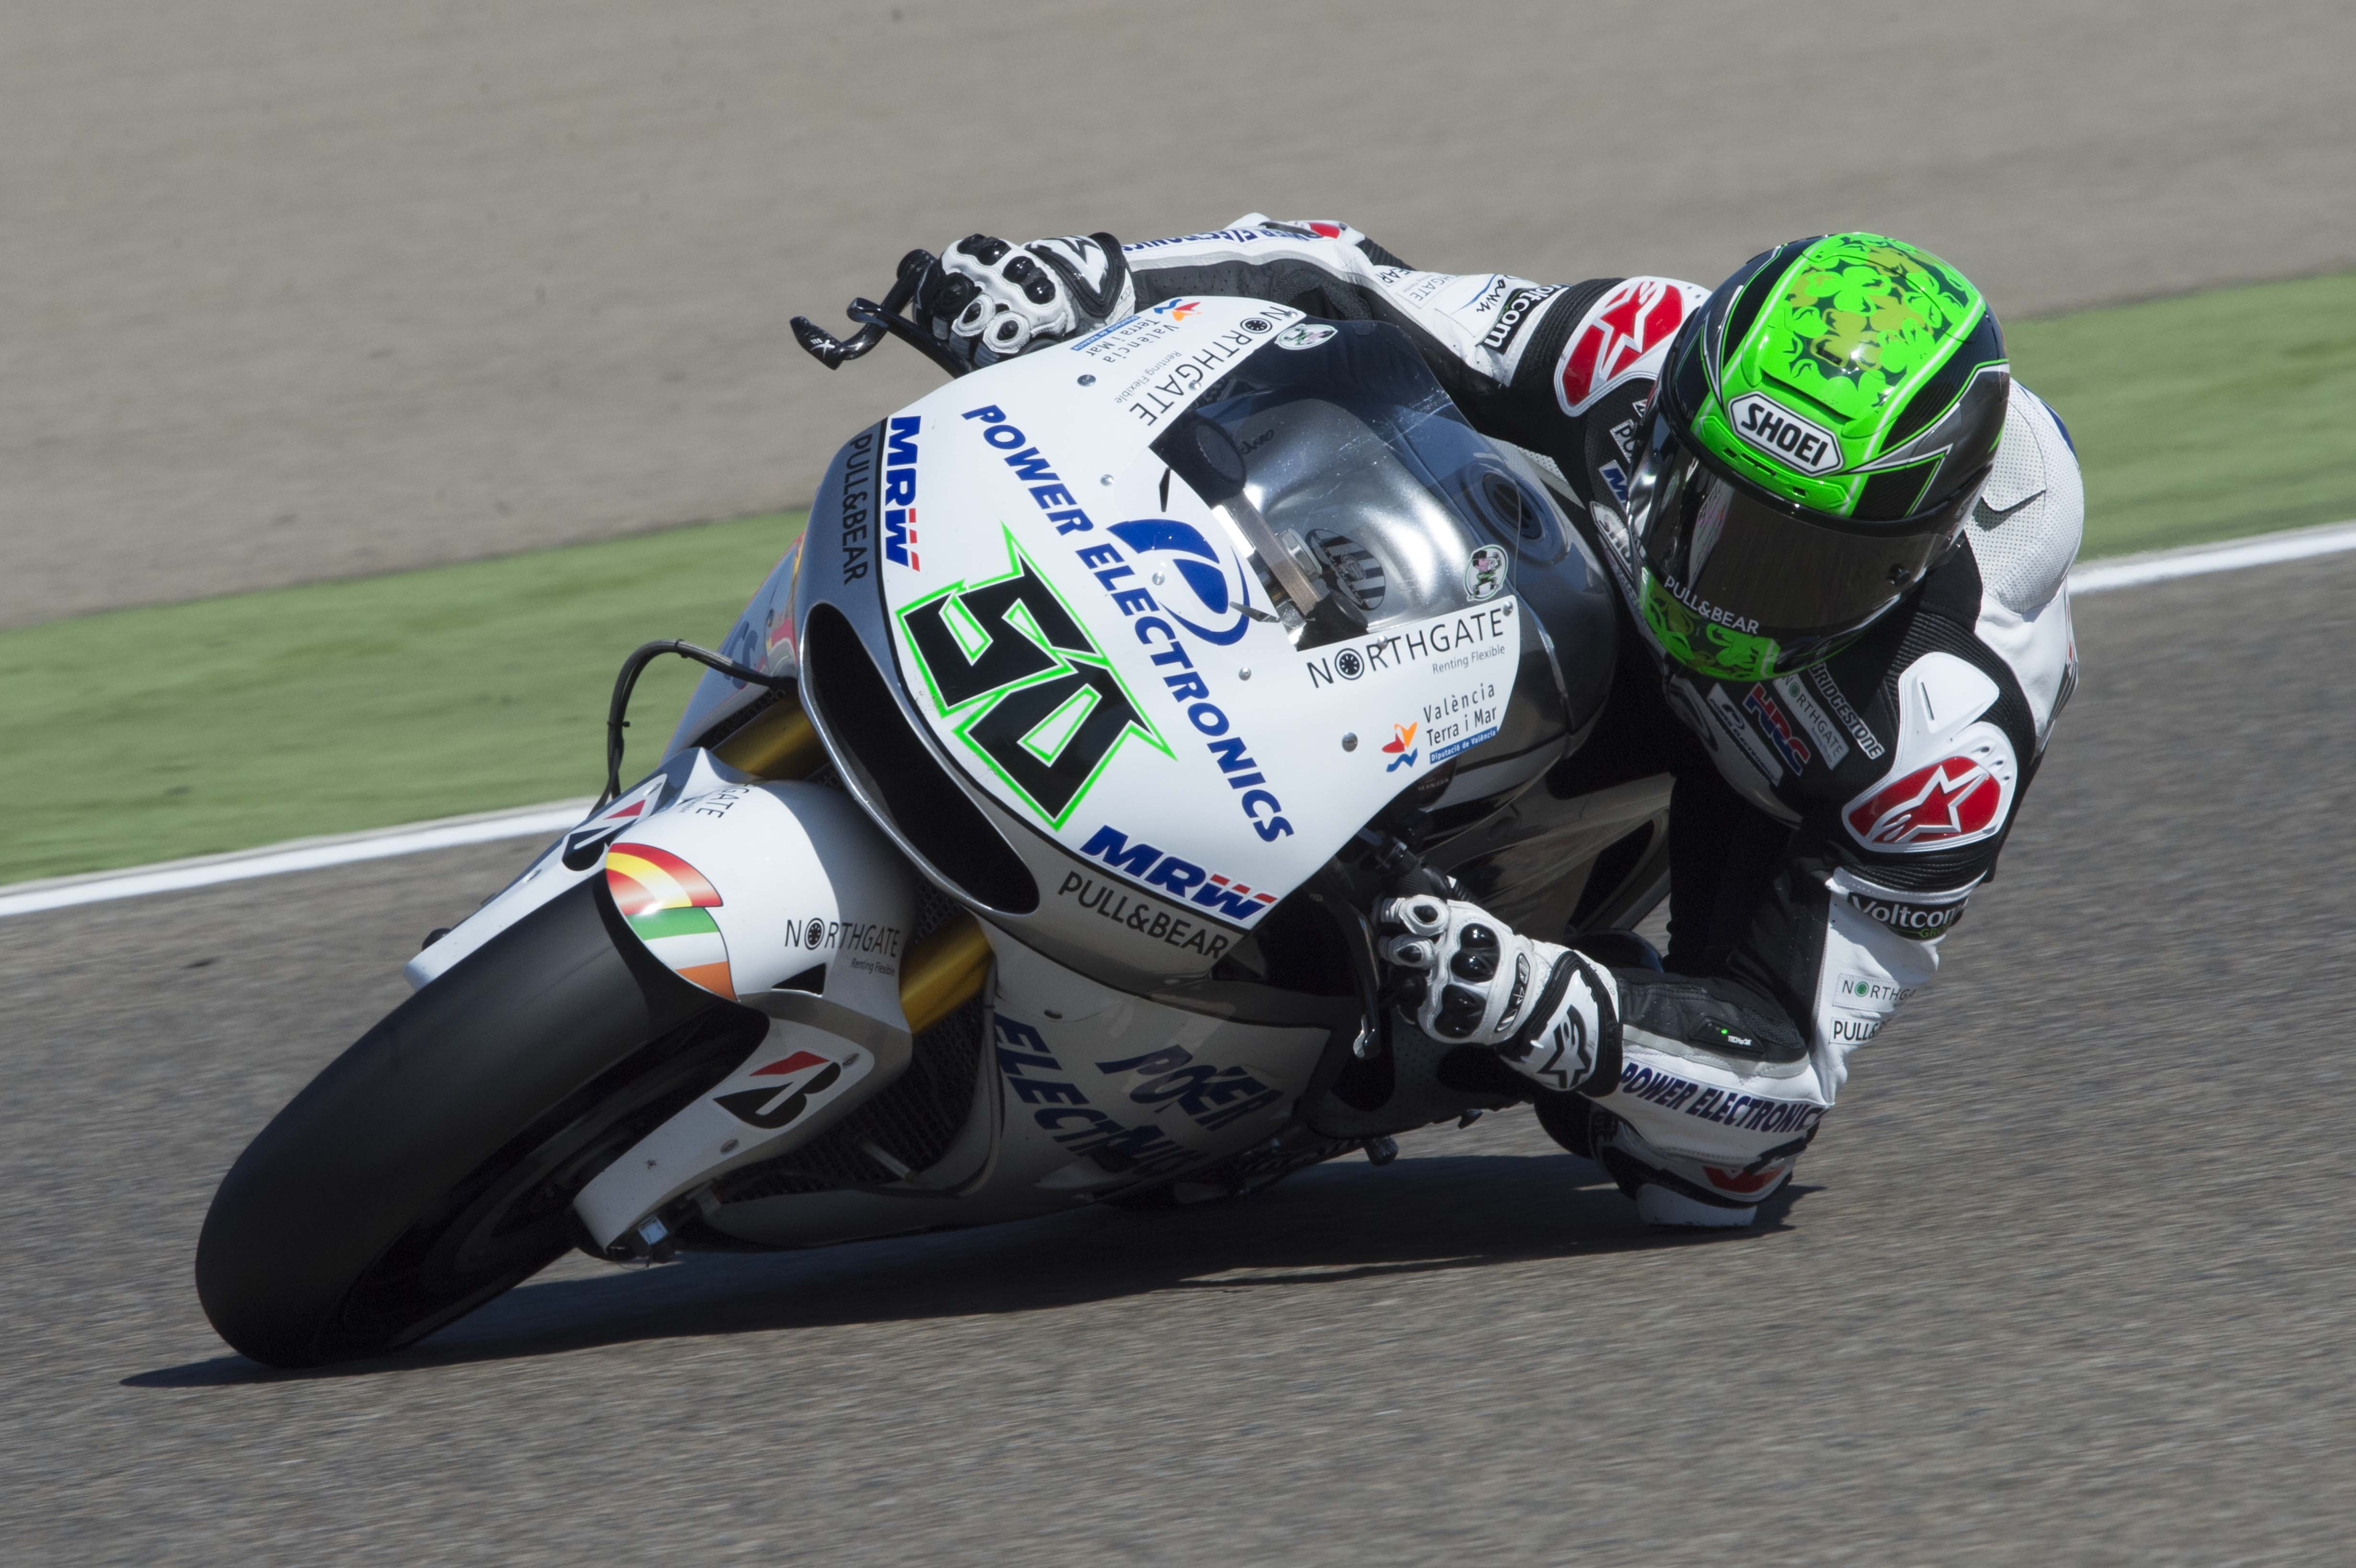 Aspar Ditches Honda, Buys Ducati Bikes and Showa Suspensions for the 2016 MotoGP - autoevolution